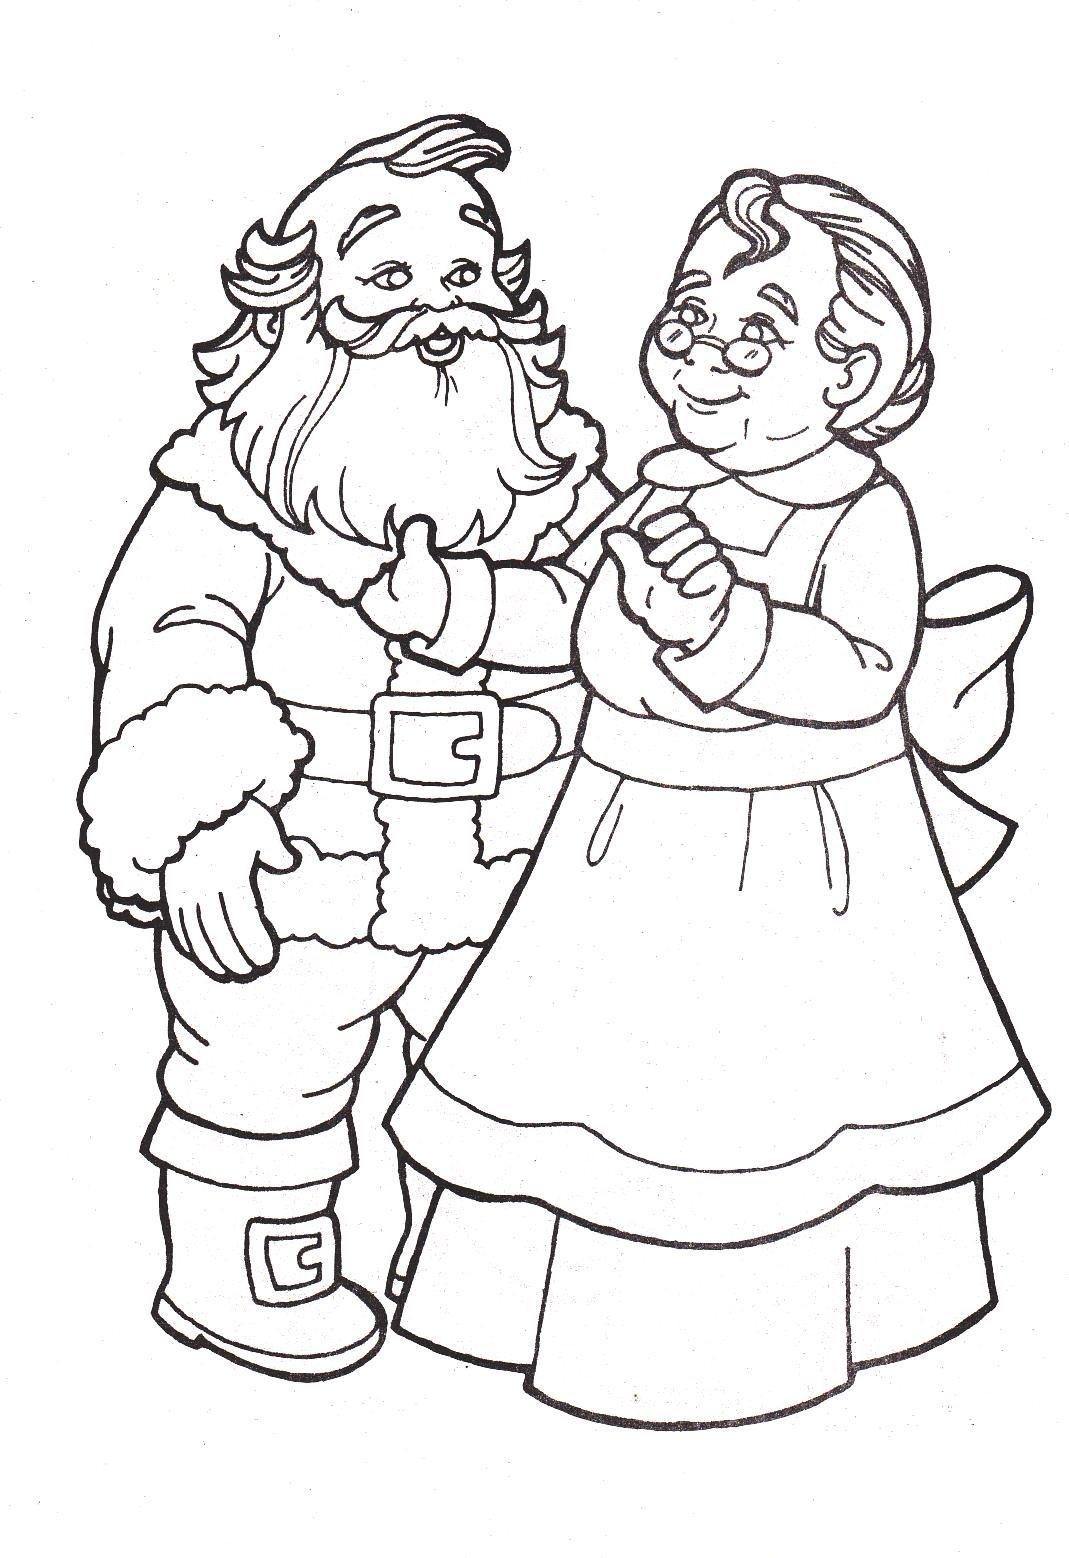 Mr And Mrs Santa Claus Coloring Pages Gambar